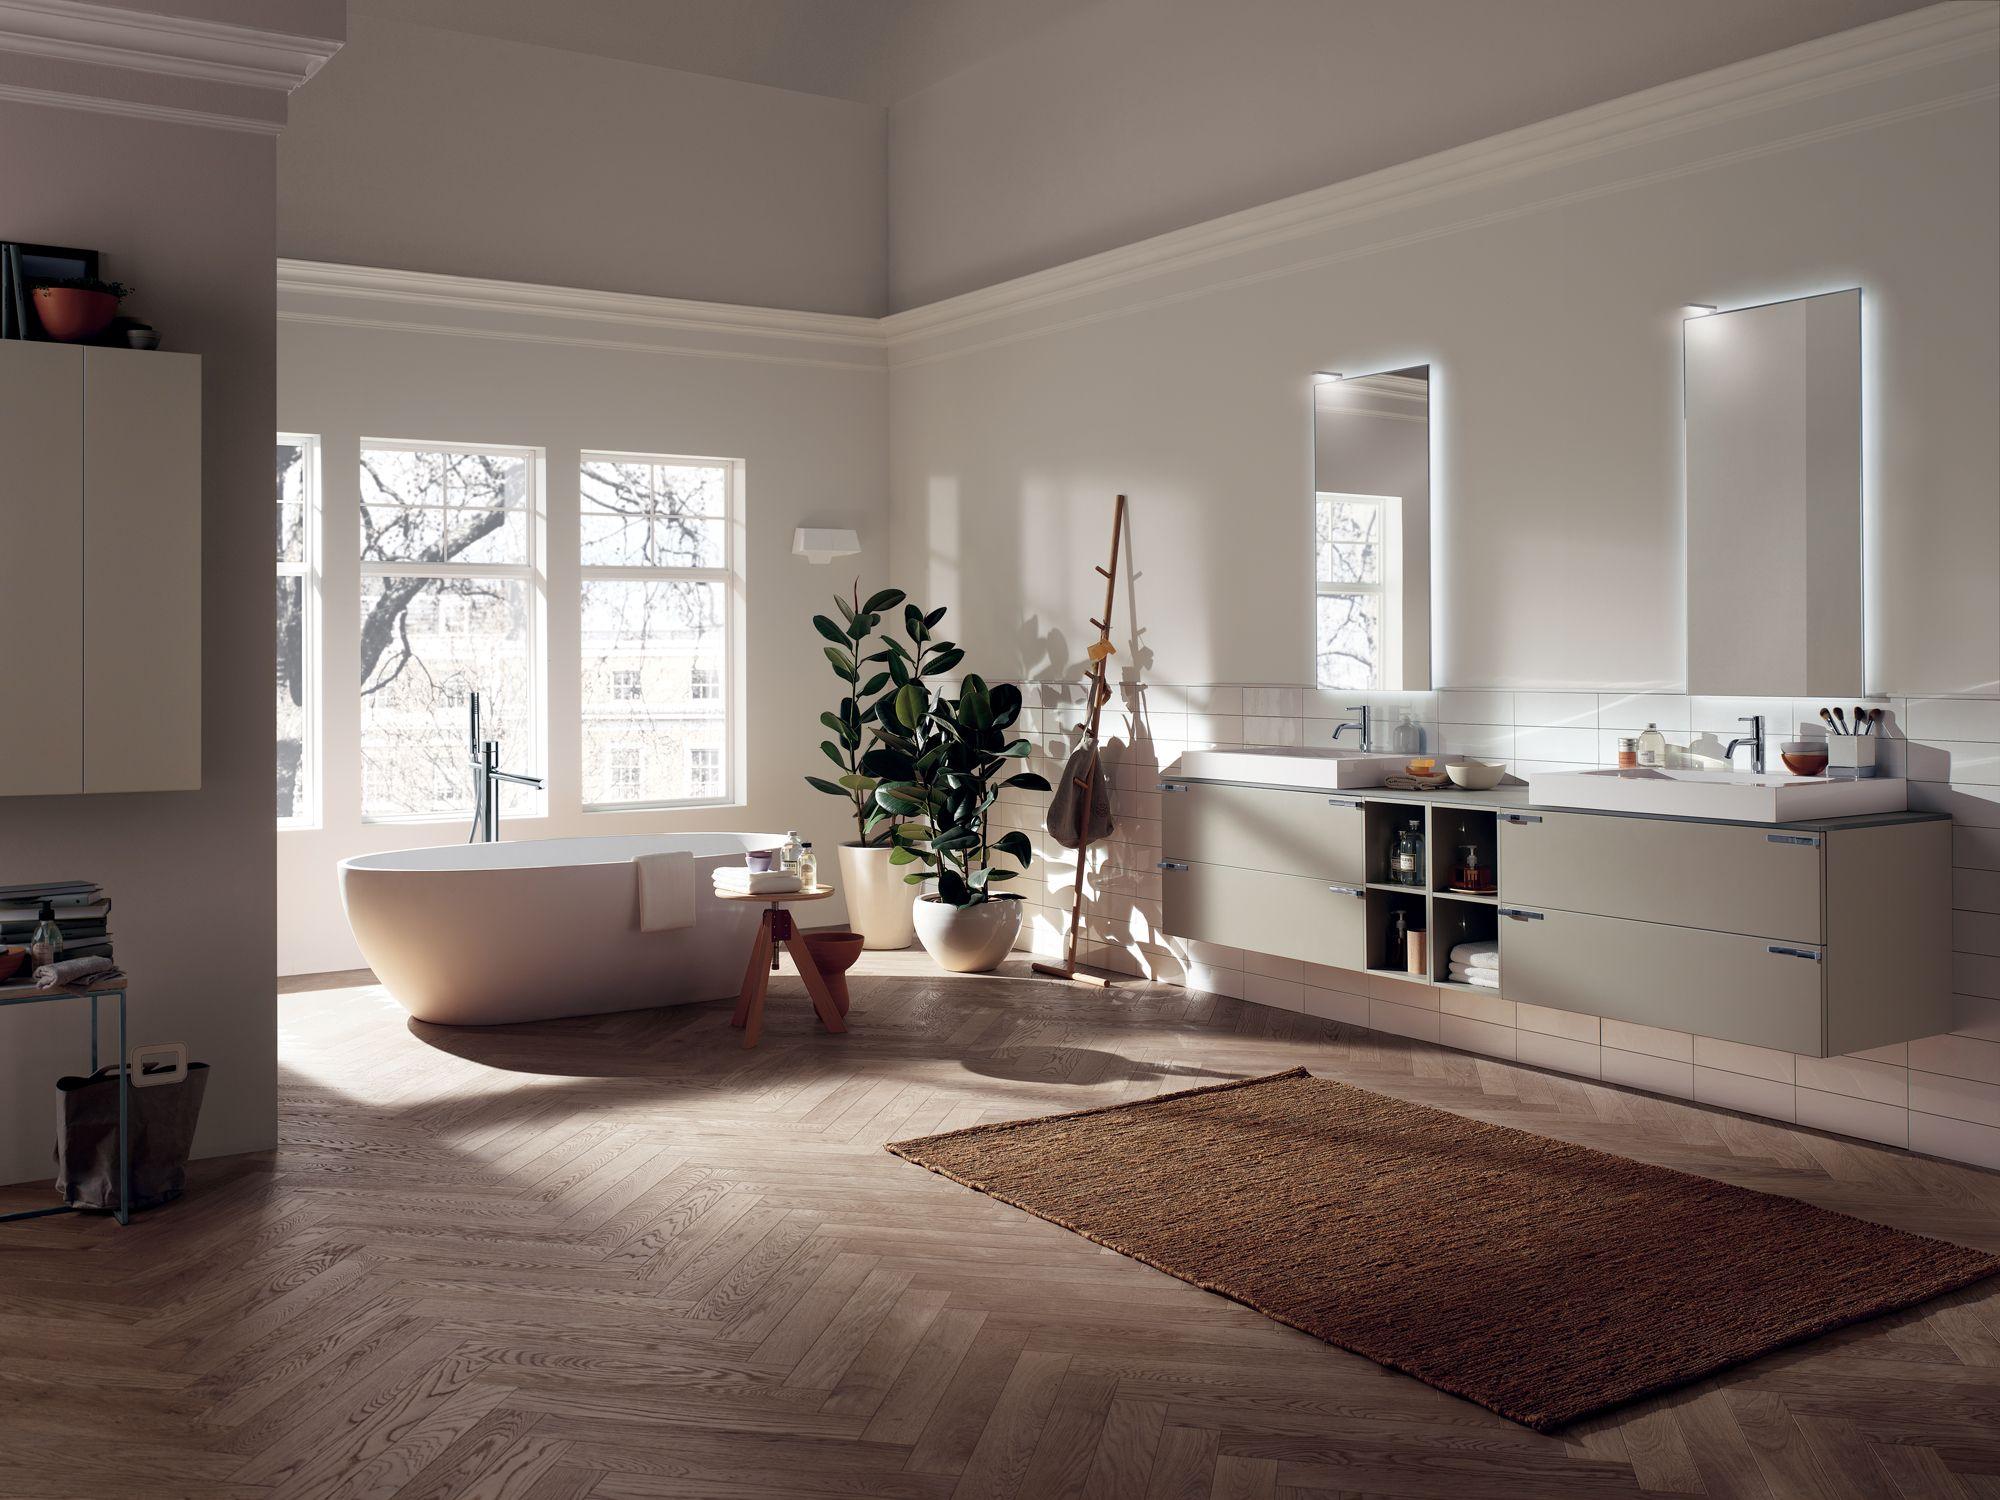 Badezimmer Ausstattung ~ Badezimmer ausstattung aquo by scavolini bathrooms design